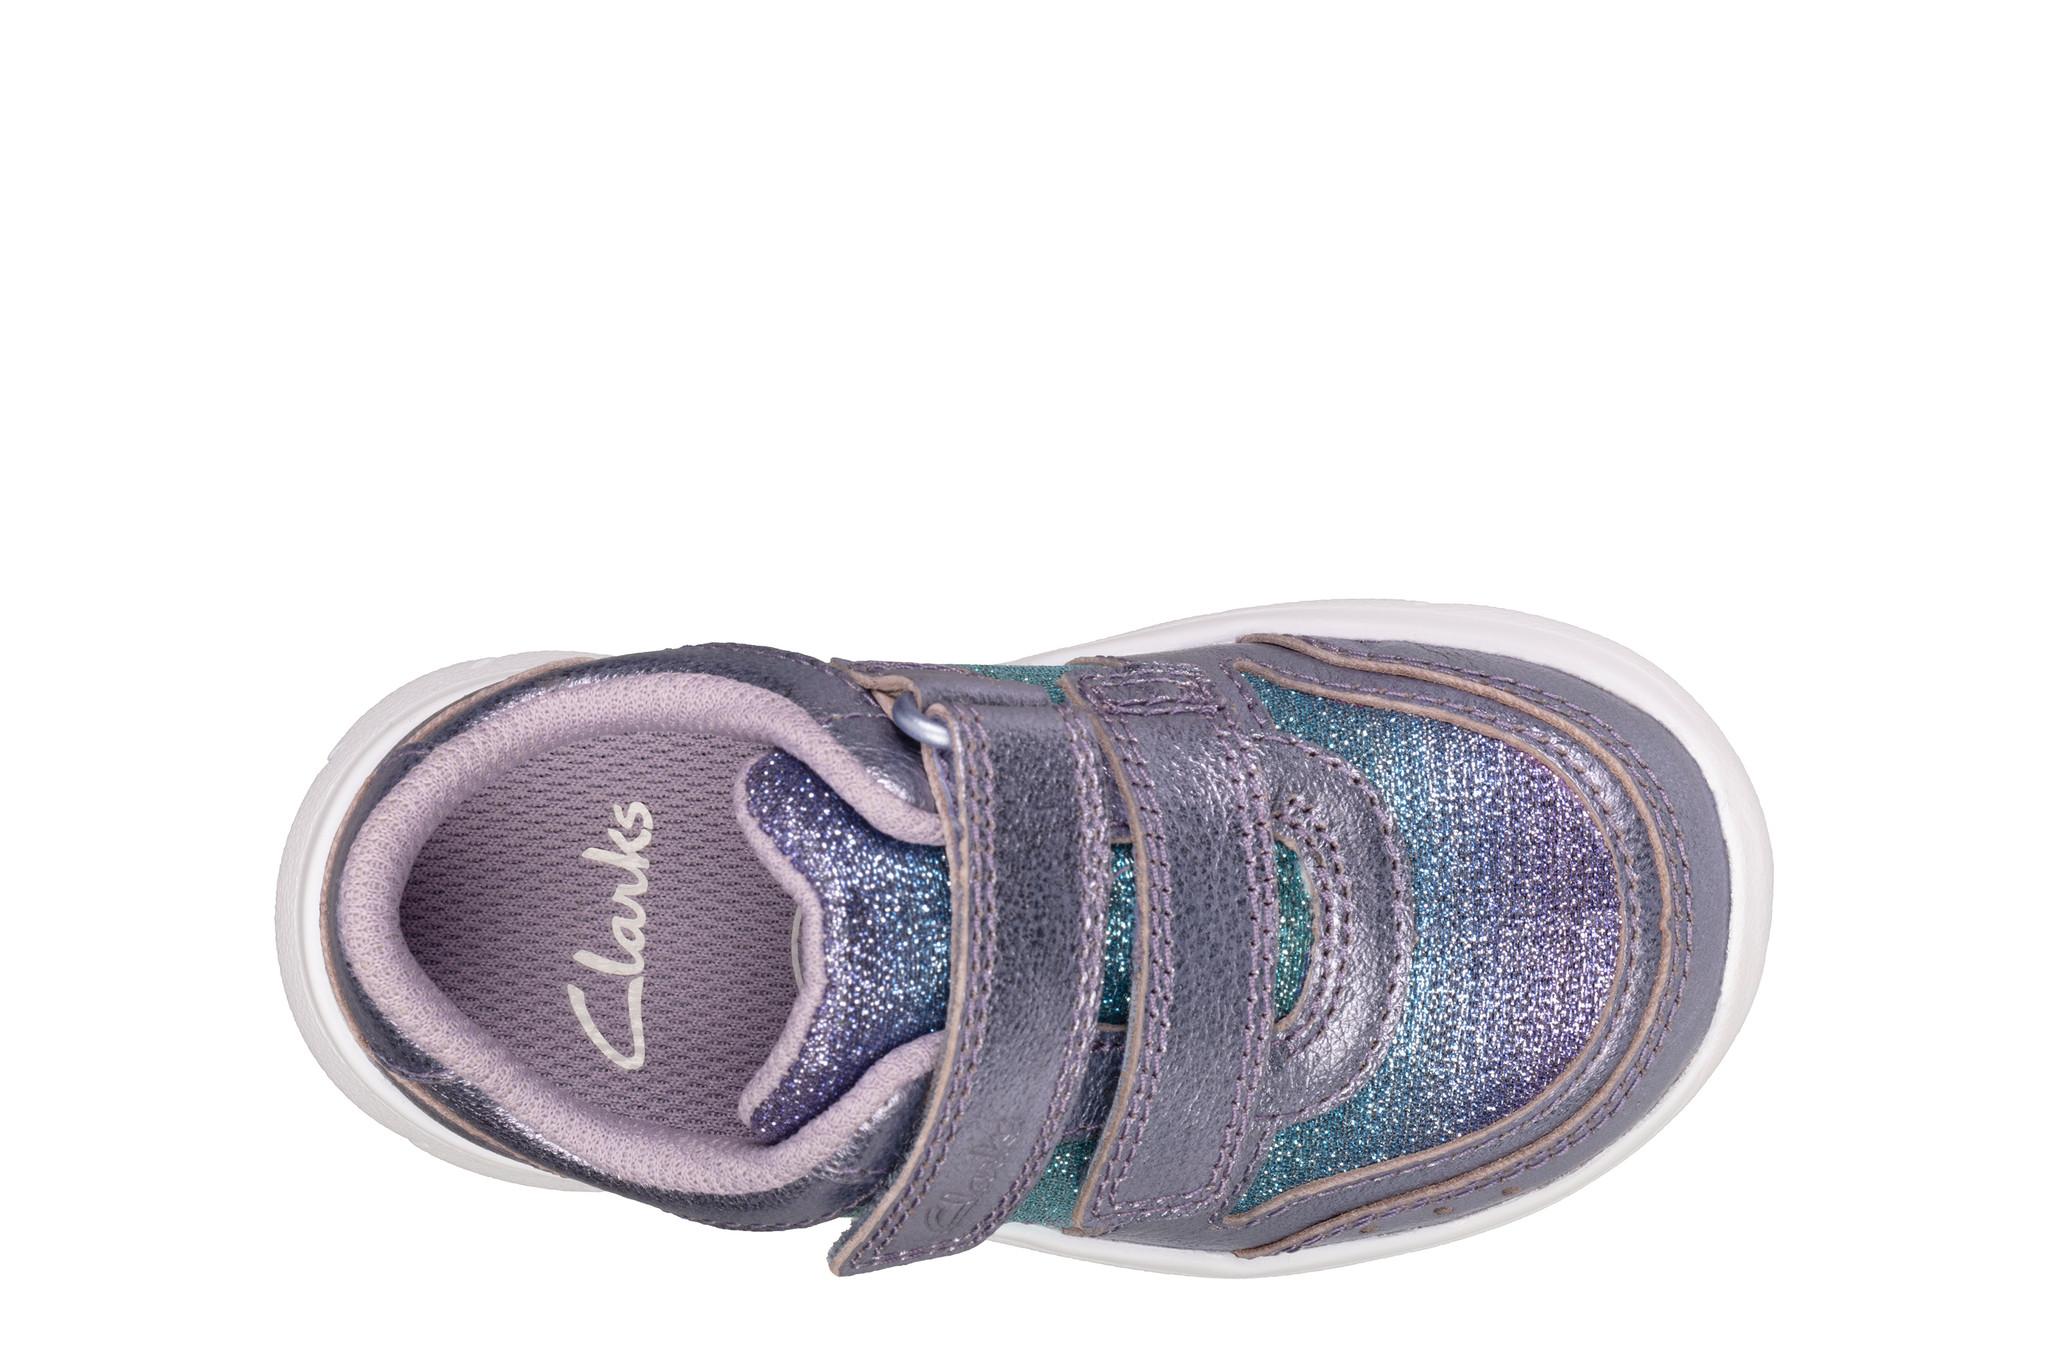 Clarks Ath Sonar Lilac Infant